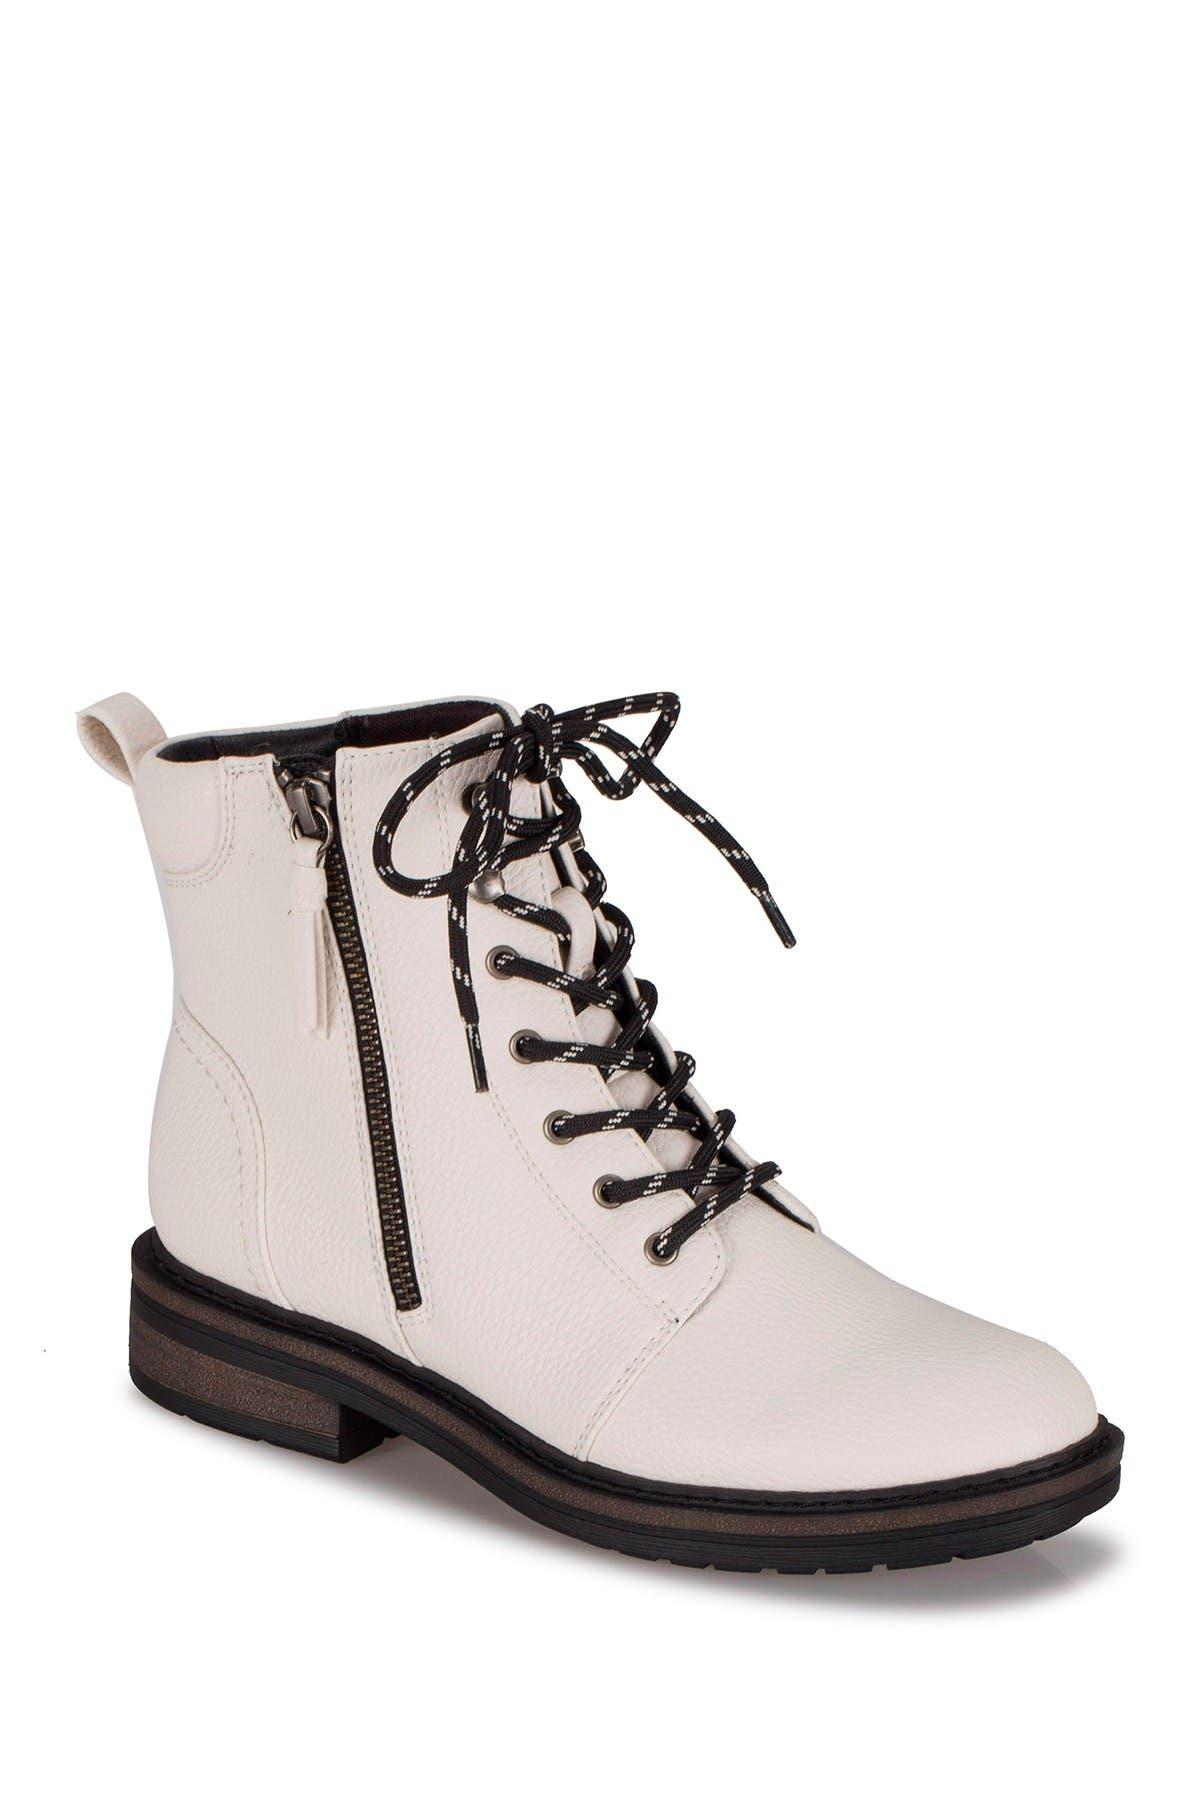 Image of BareTraps Amysue Lace Up Boot